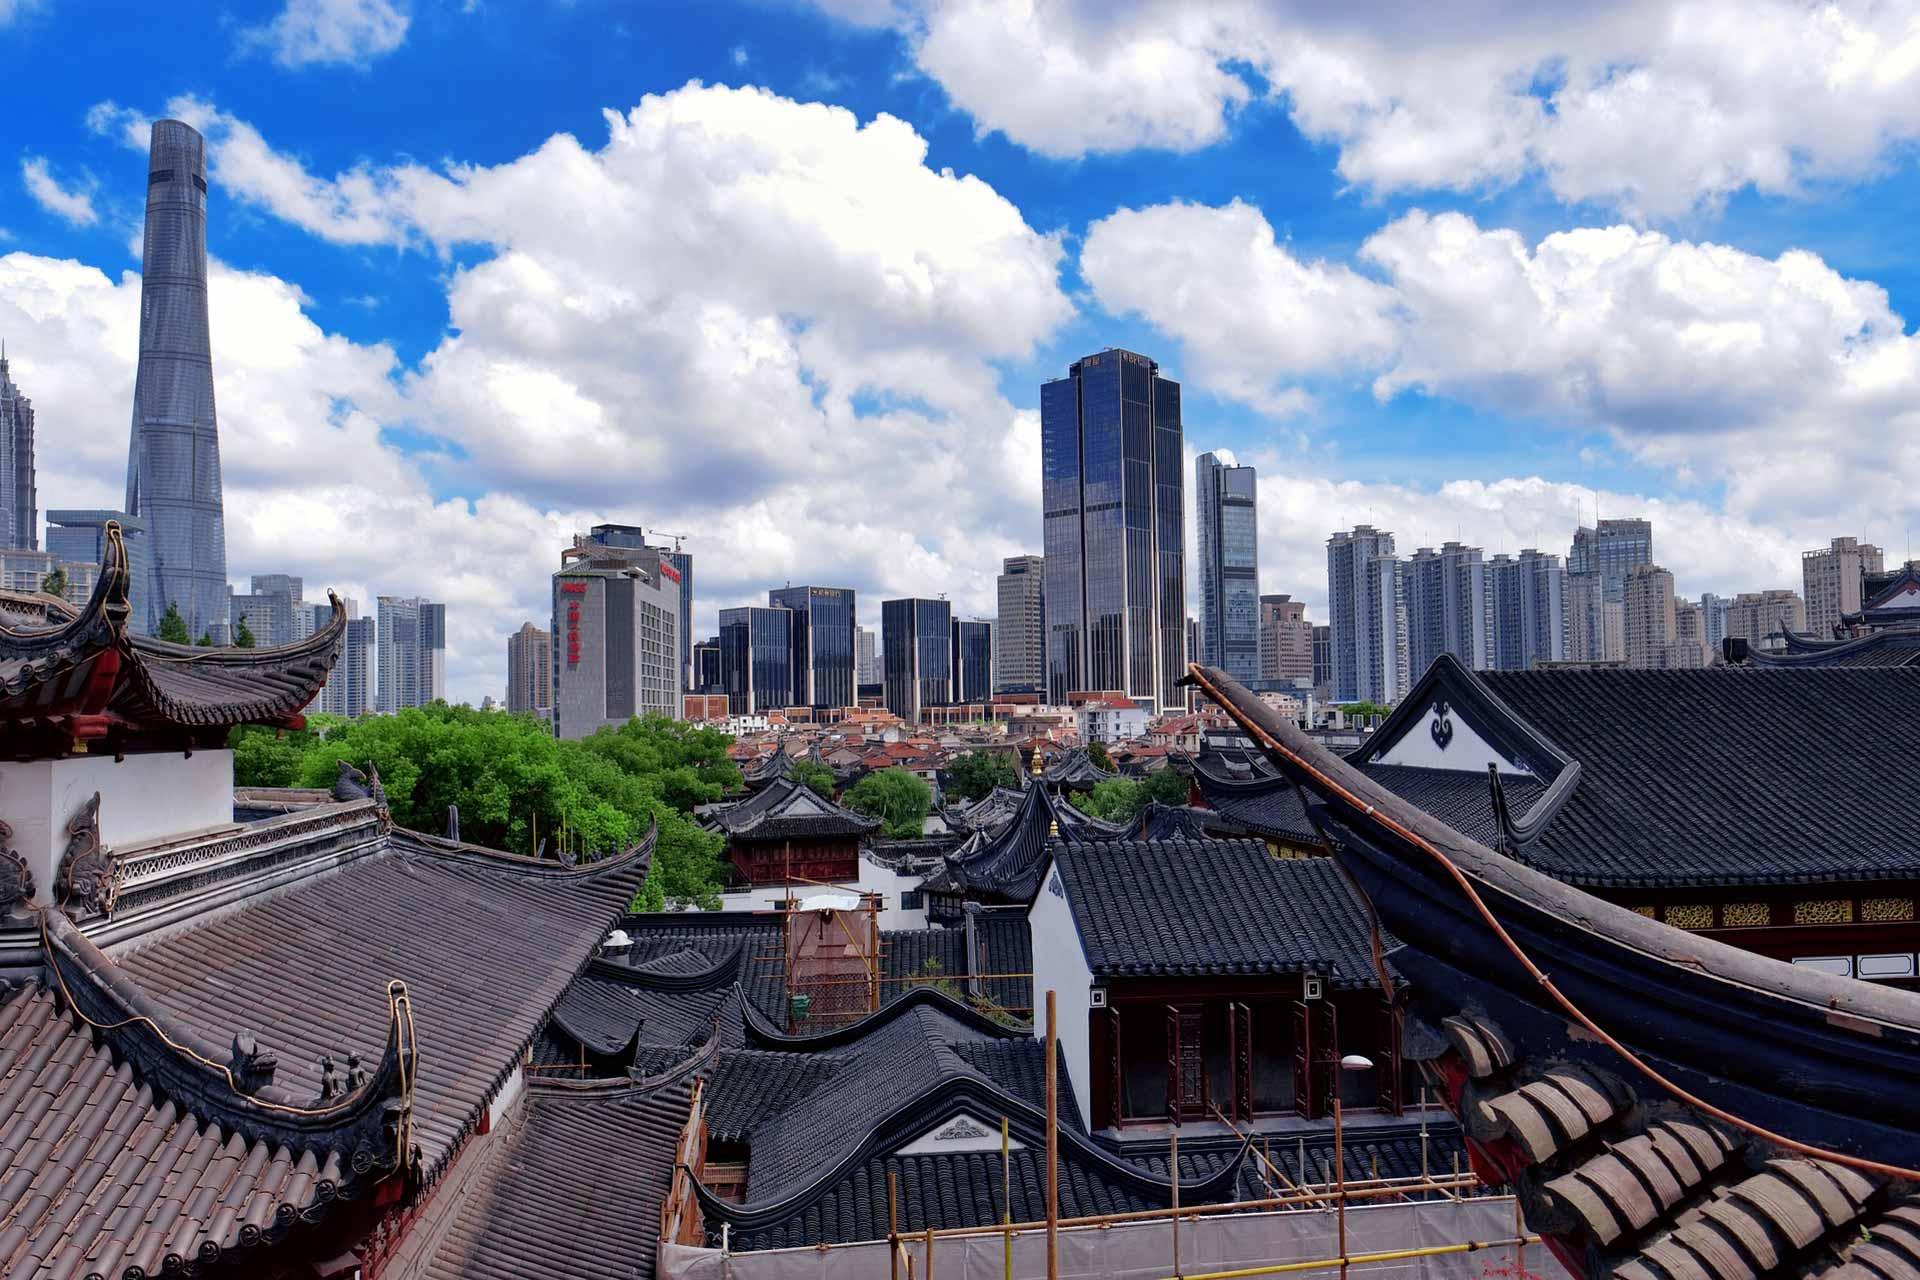 Shanghai - People's Republic of China